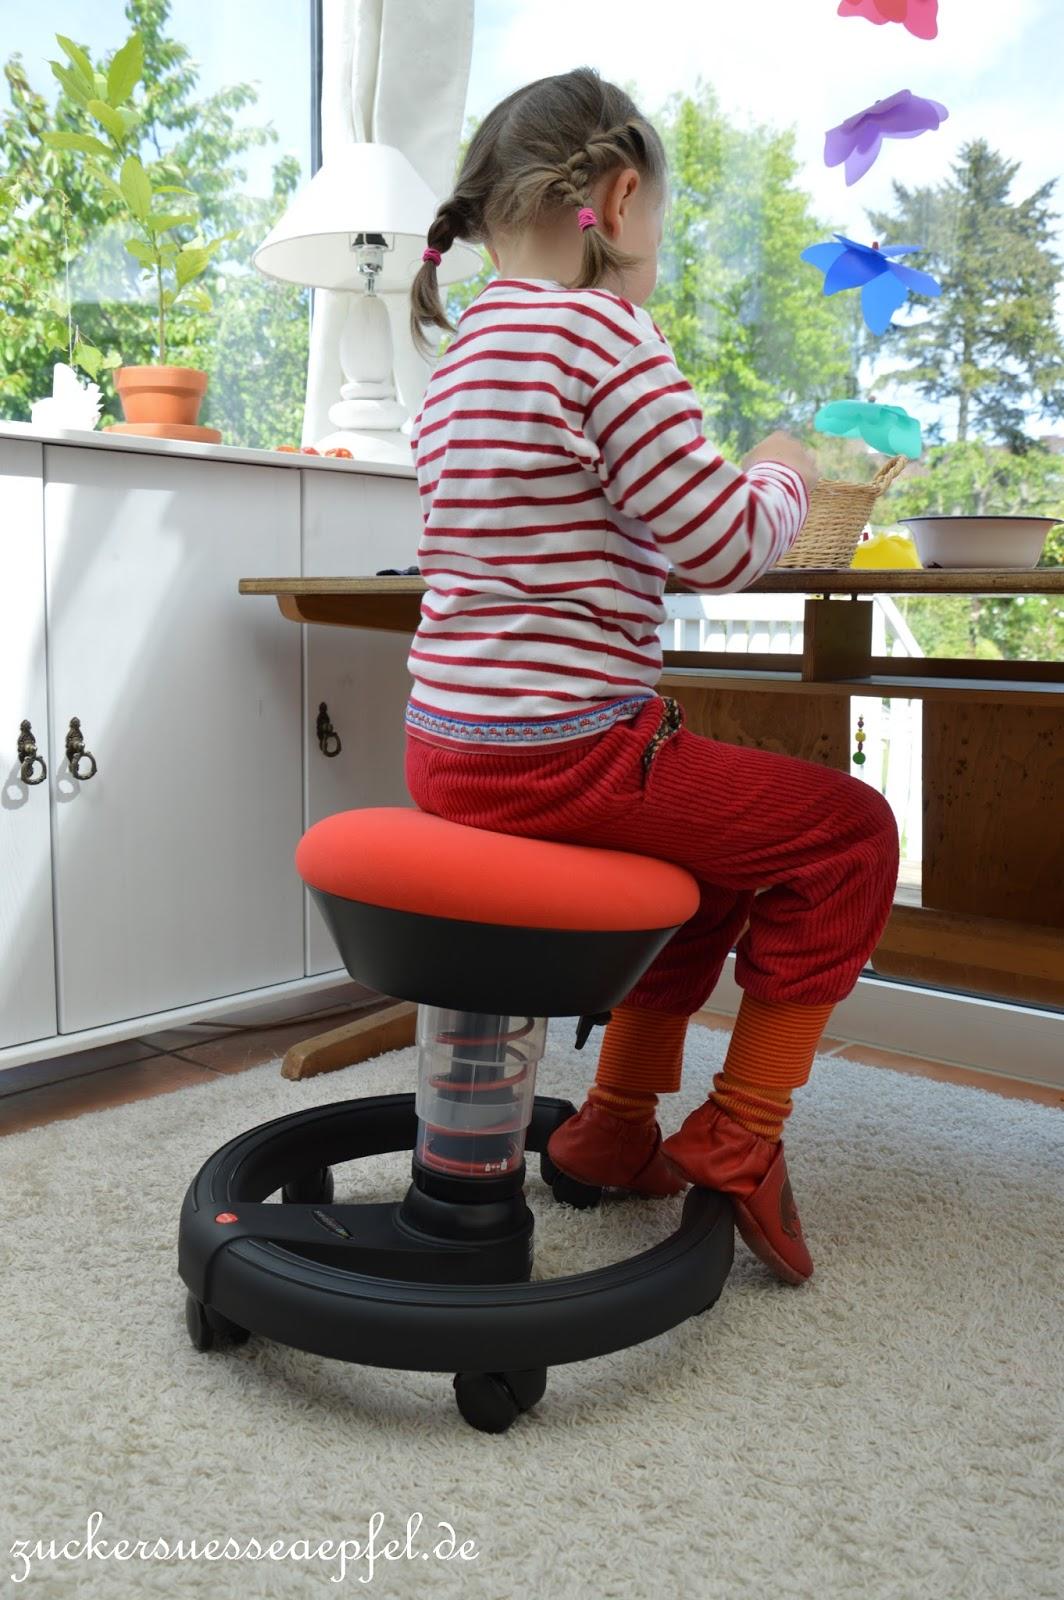 auch am schreibtisch aktiv sein so gehts zuckers e pfel kreativer familienblog. Black Bedroom Furniture Sets. Home Design Ideas